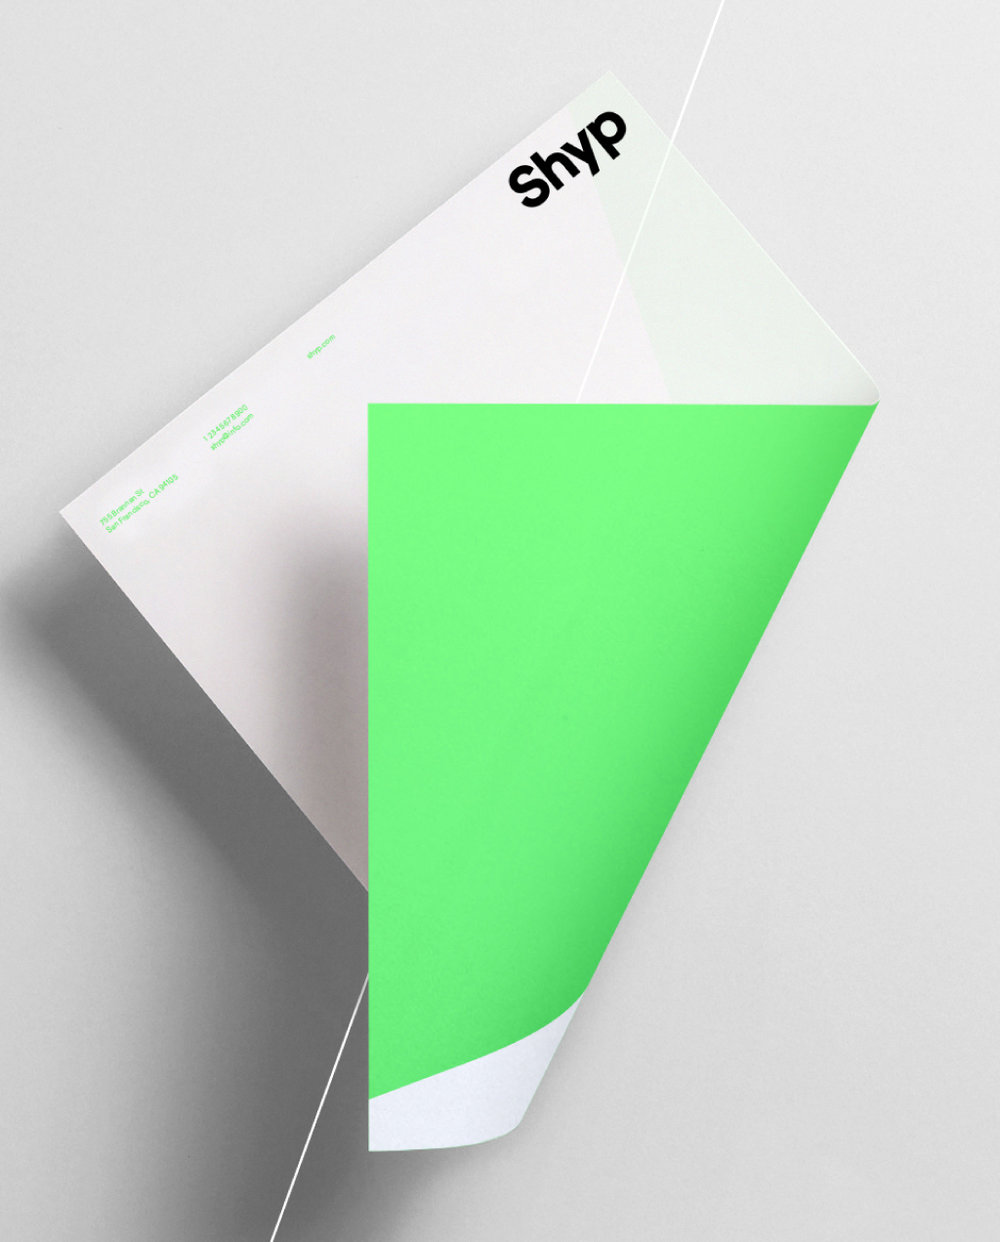 Shyp_Letterhead_crop.jpg